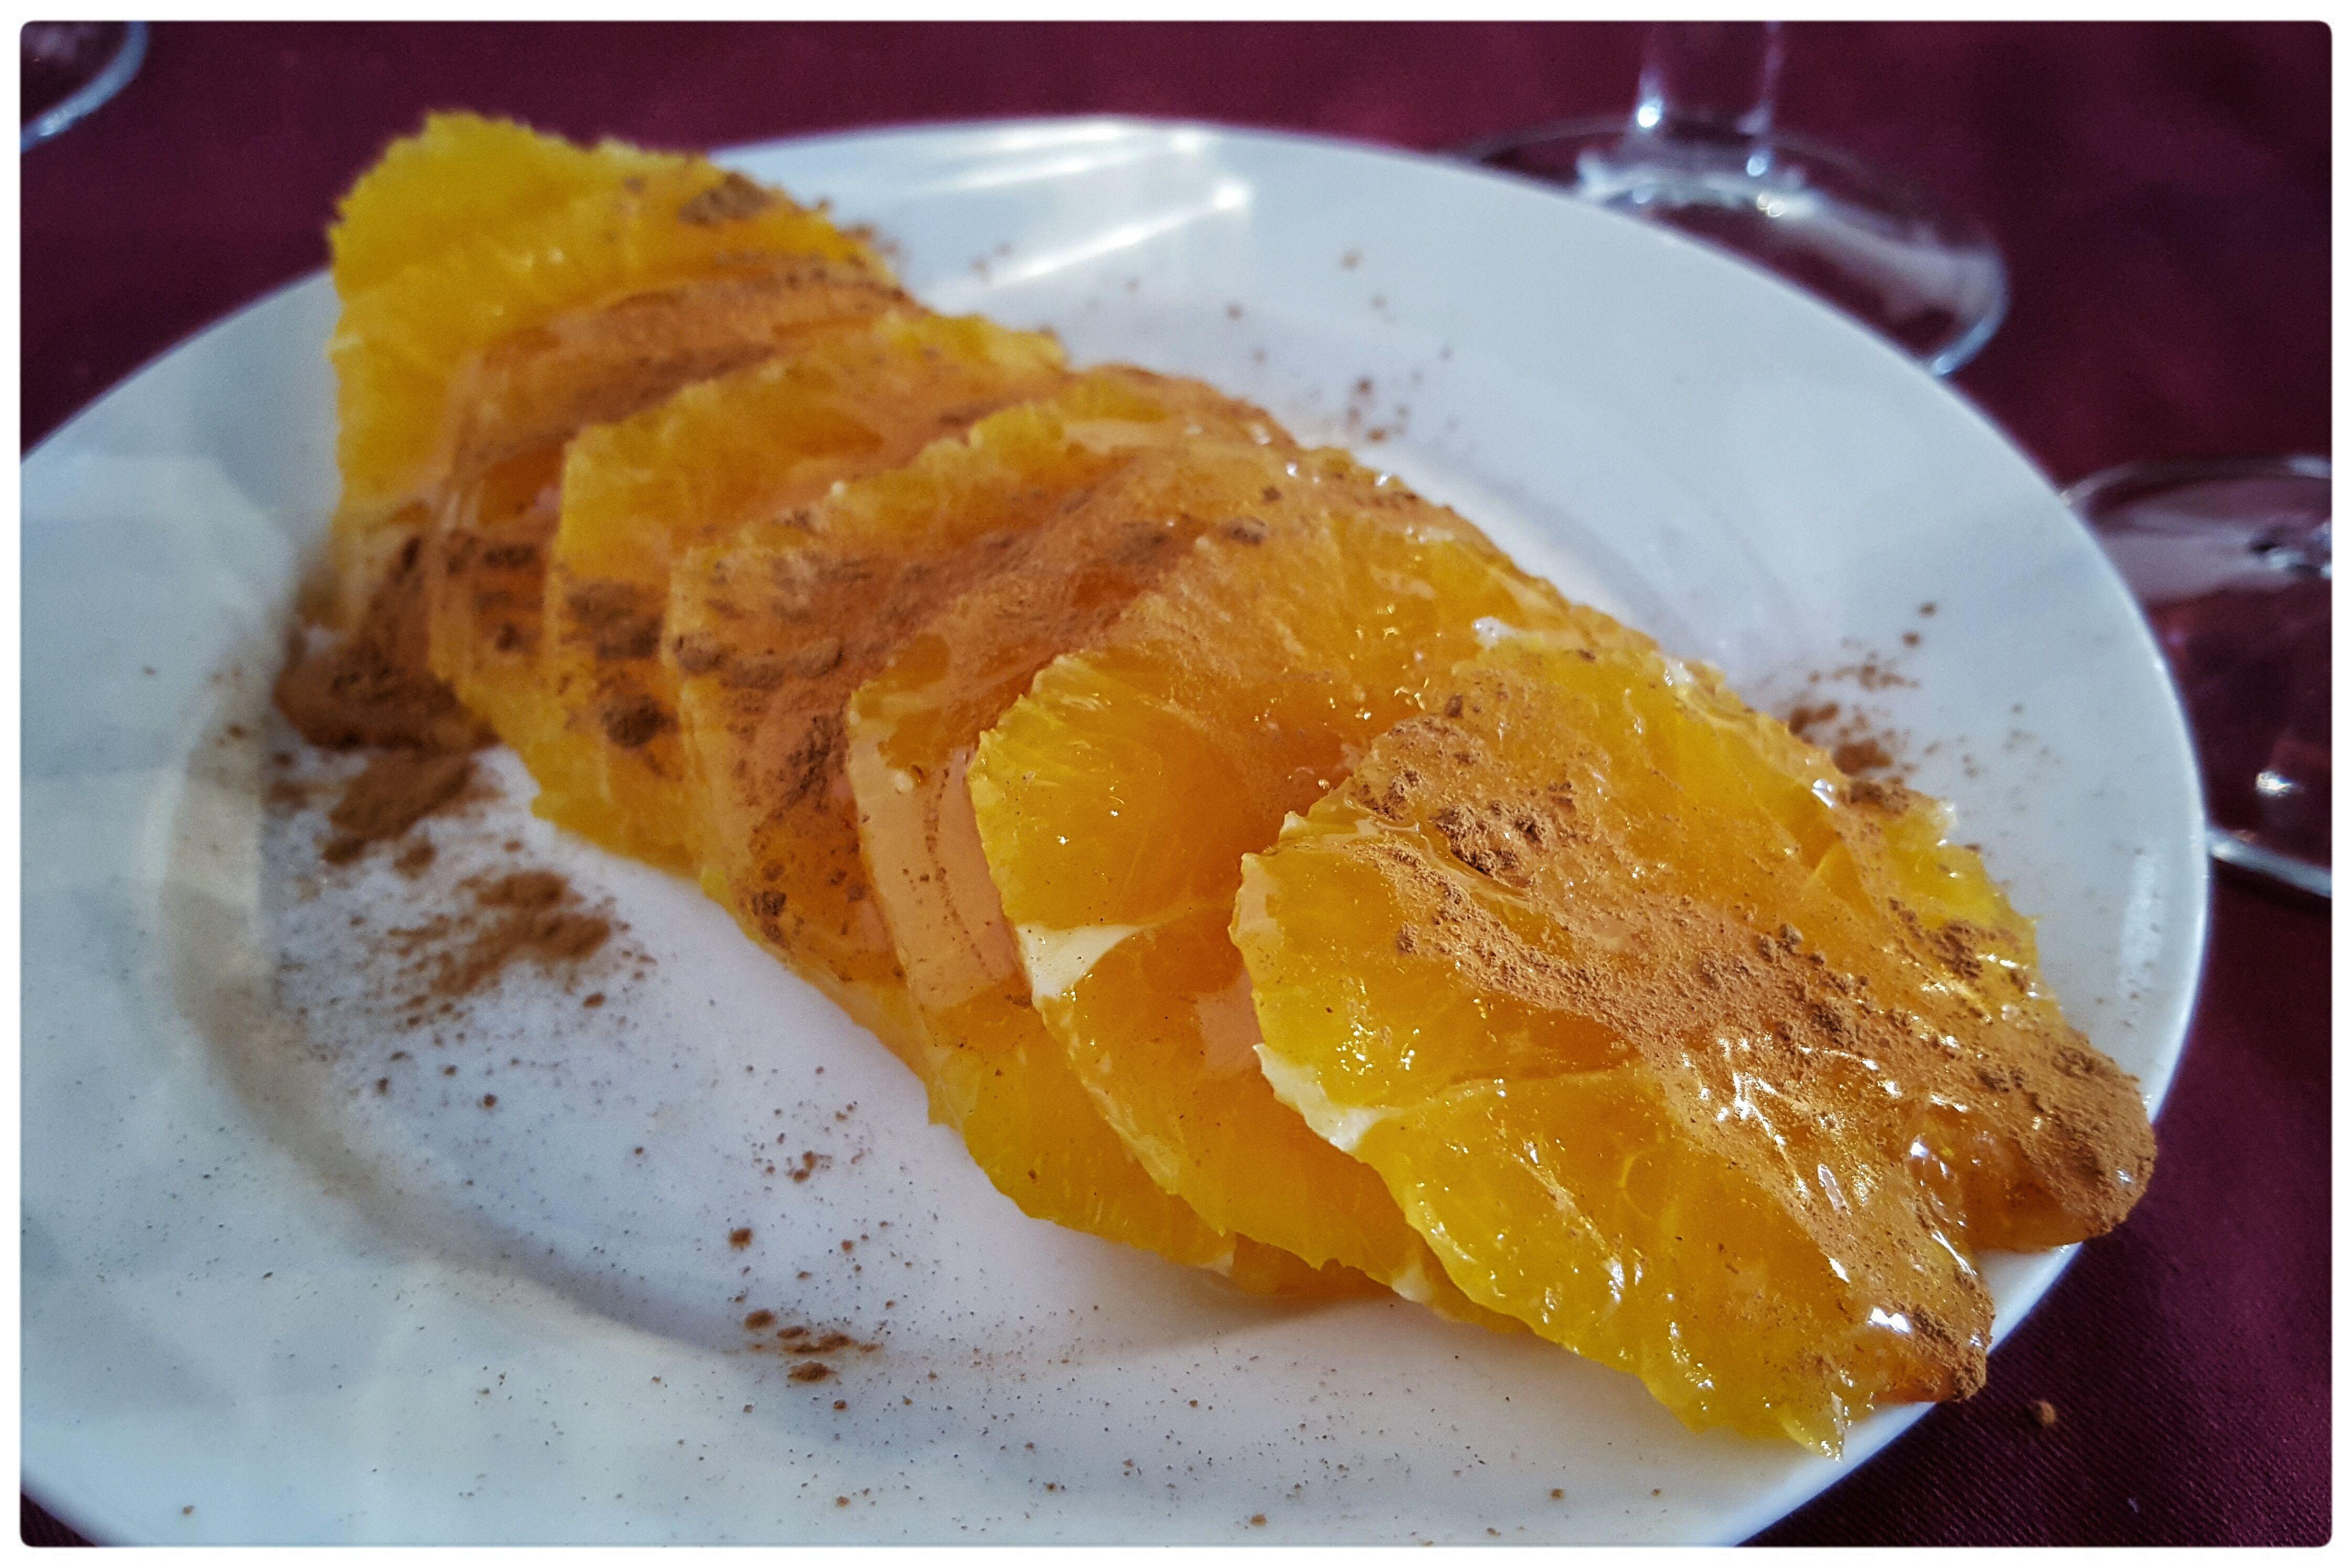 Close-Up Of Sliced Oranges On Plate